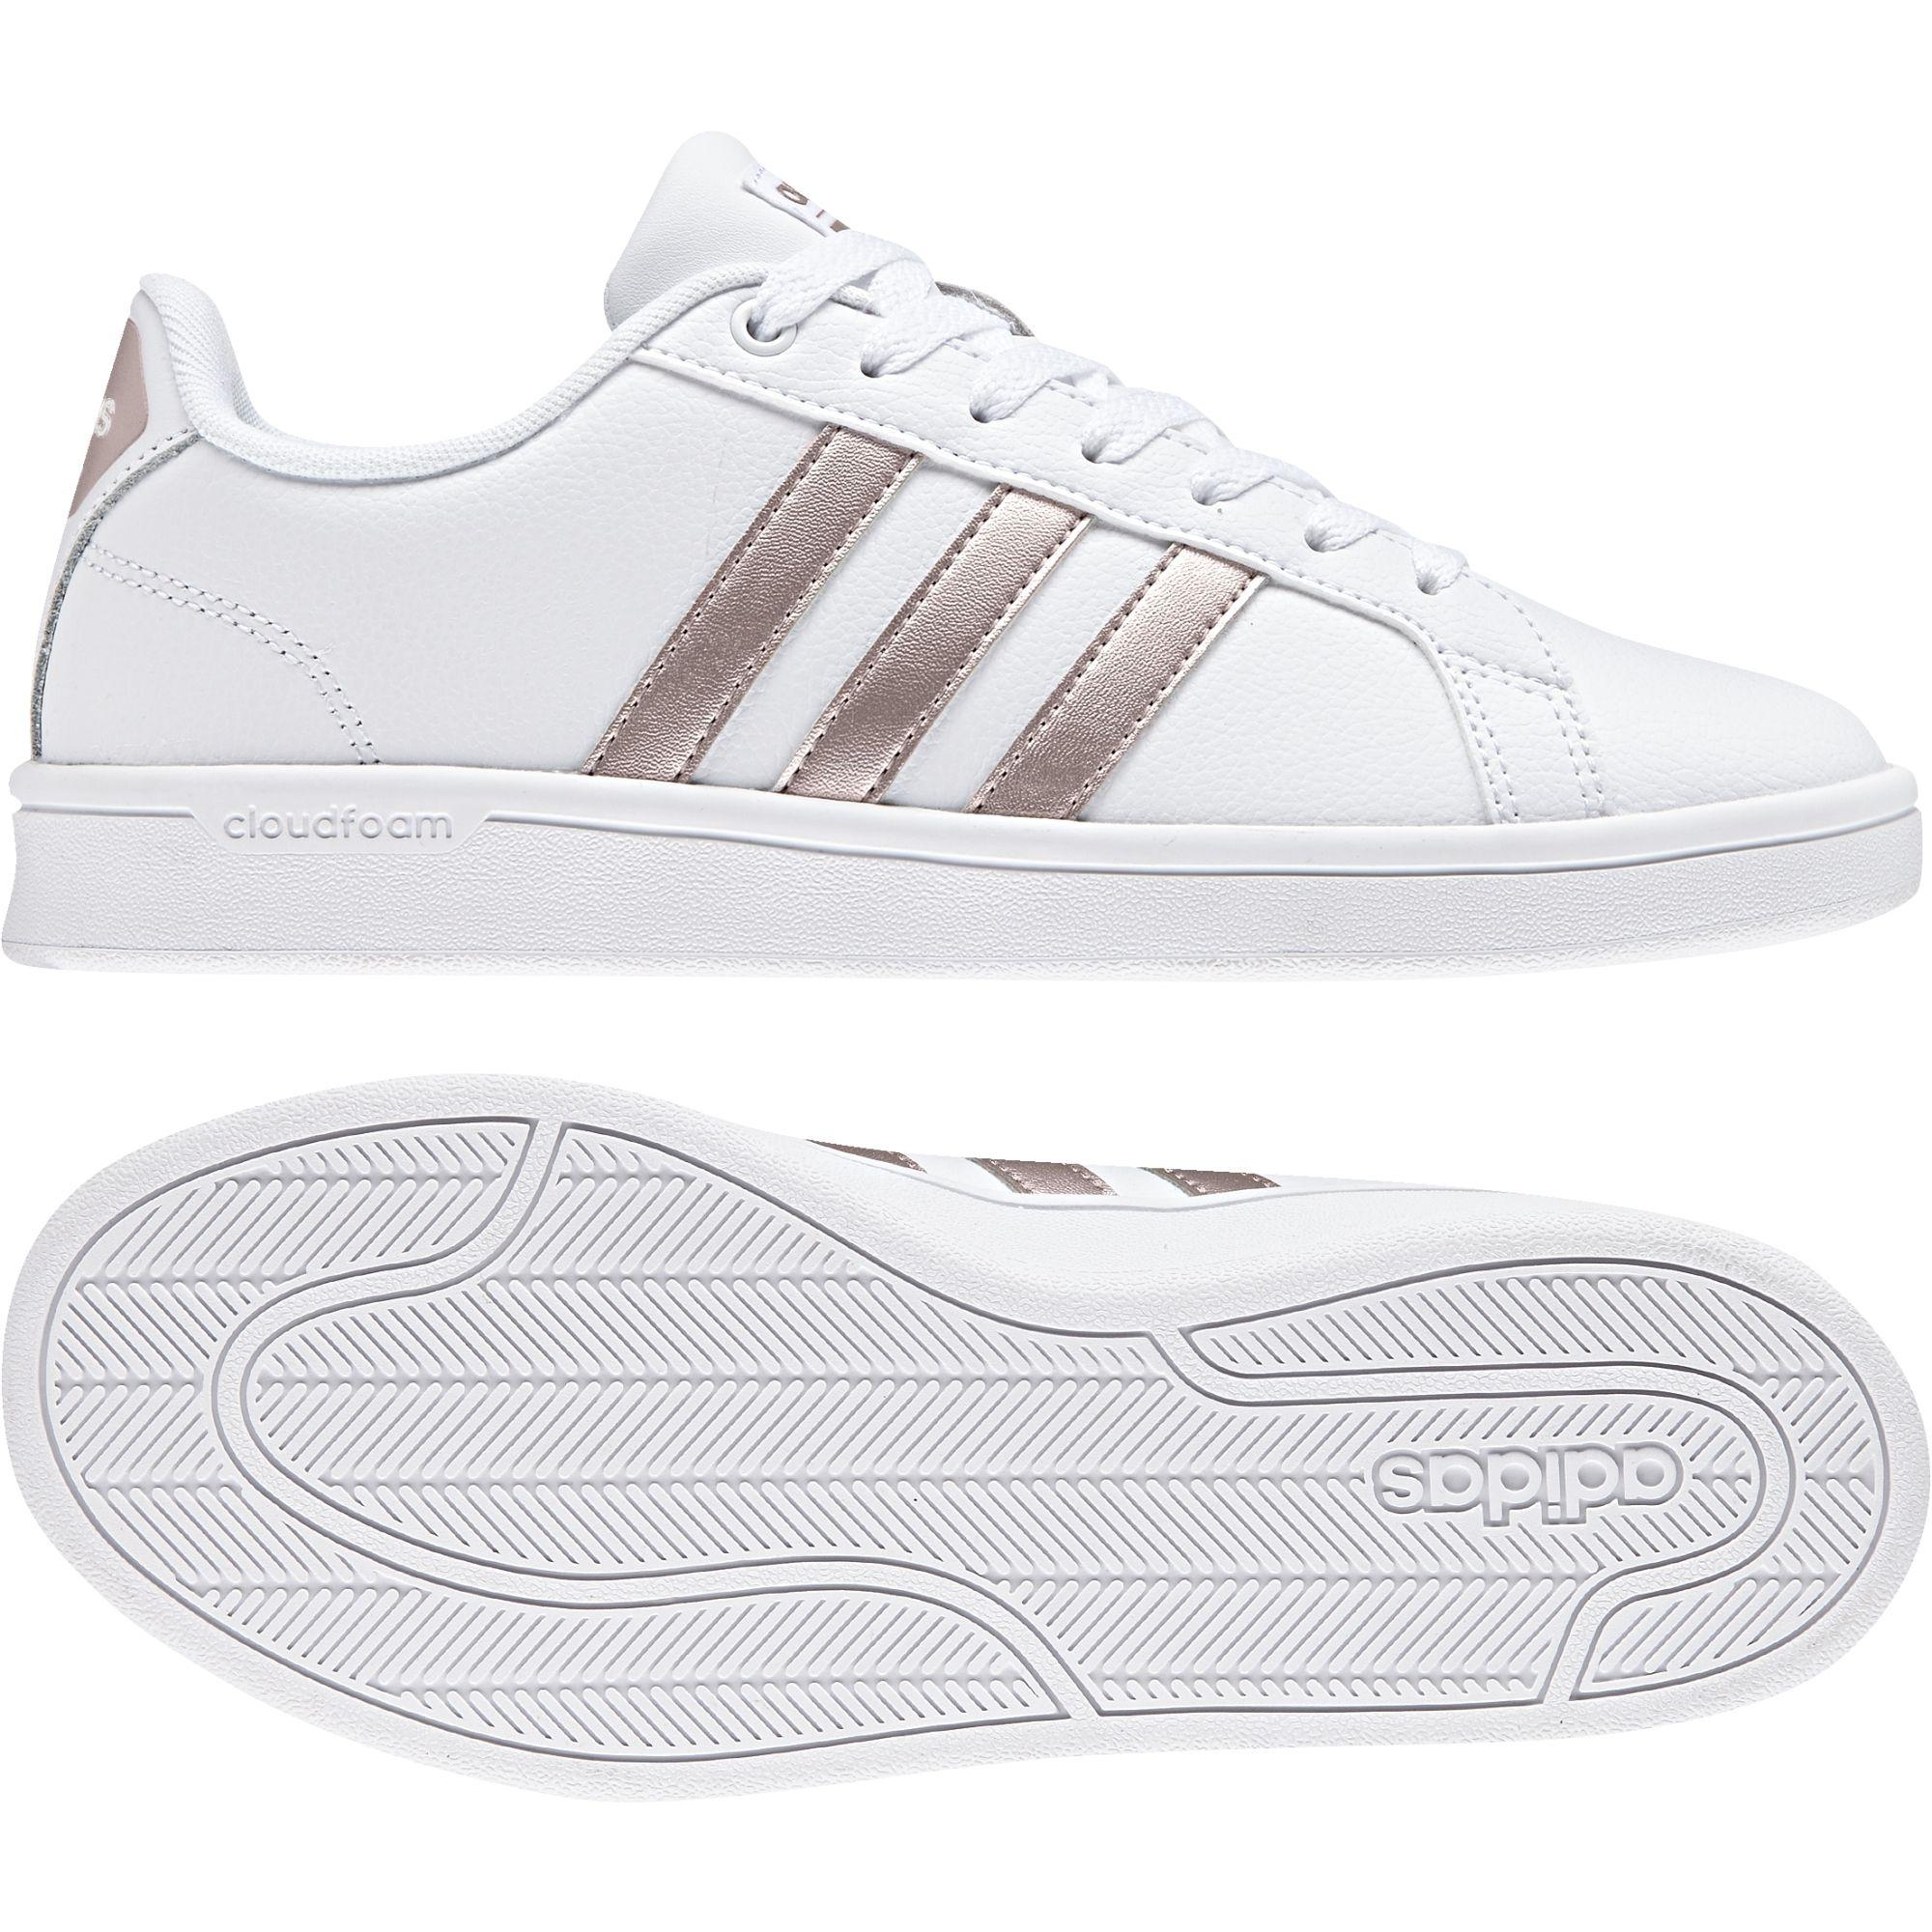 6fa98ac0d Adidas női cipő CF ADVANTAGE   Markasbolt.hu Hivatalos ADIDAS forgalmazó